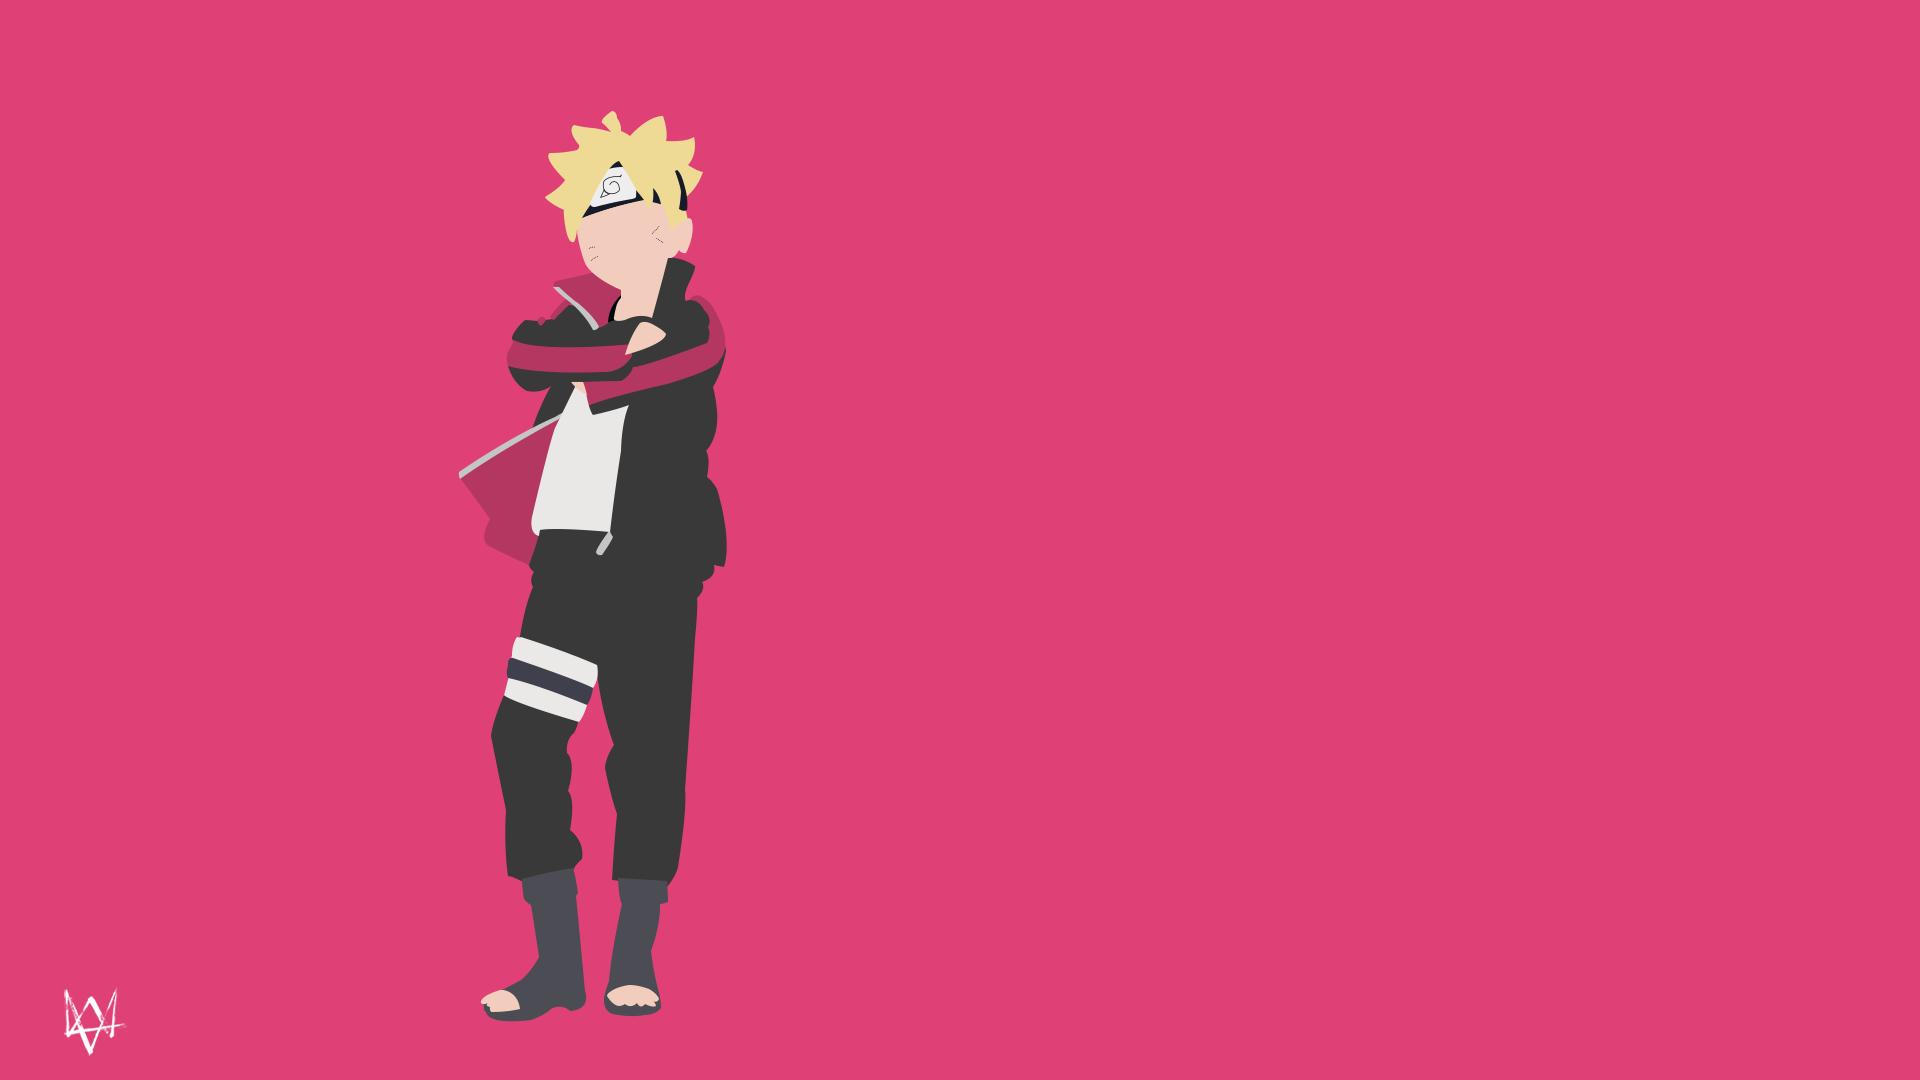 Boruto Uzumaki Naruto Minimalist Wallpaper Anime By